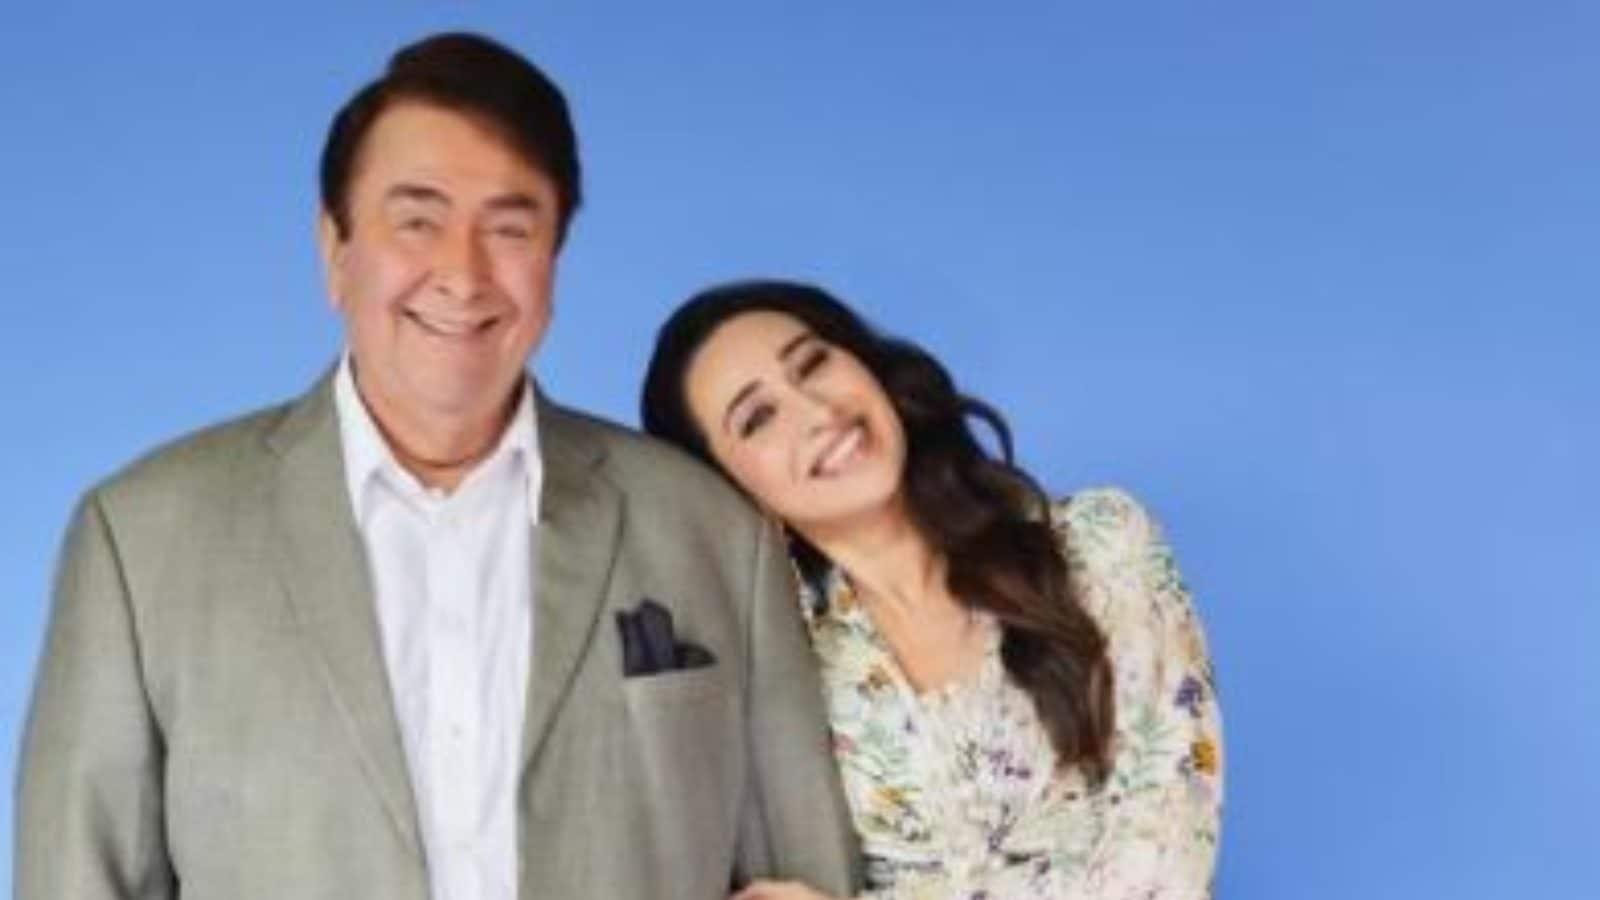 Kareena Kapoor Khan Showers Love on Karisma Kapoor, Randhir Kapoor as They  Head to The Kapil Sharma Show